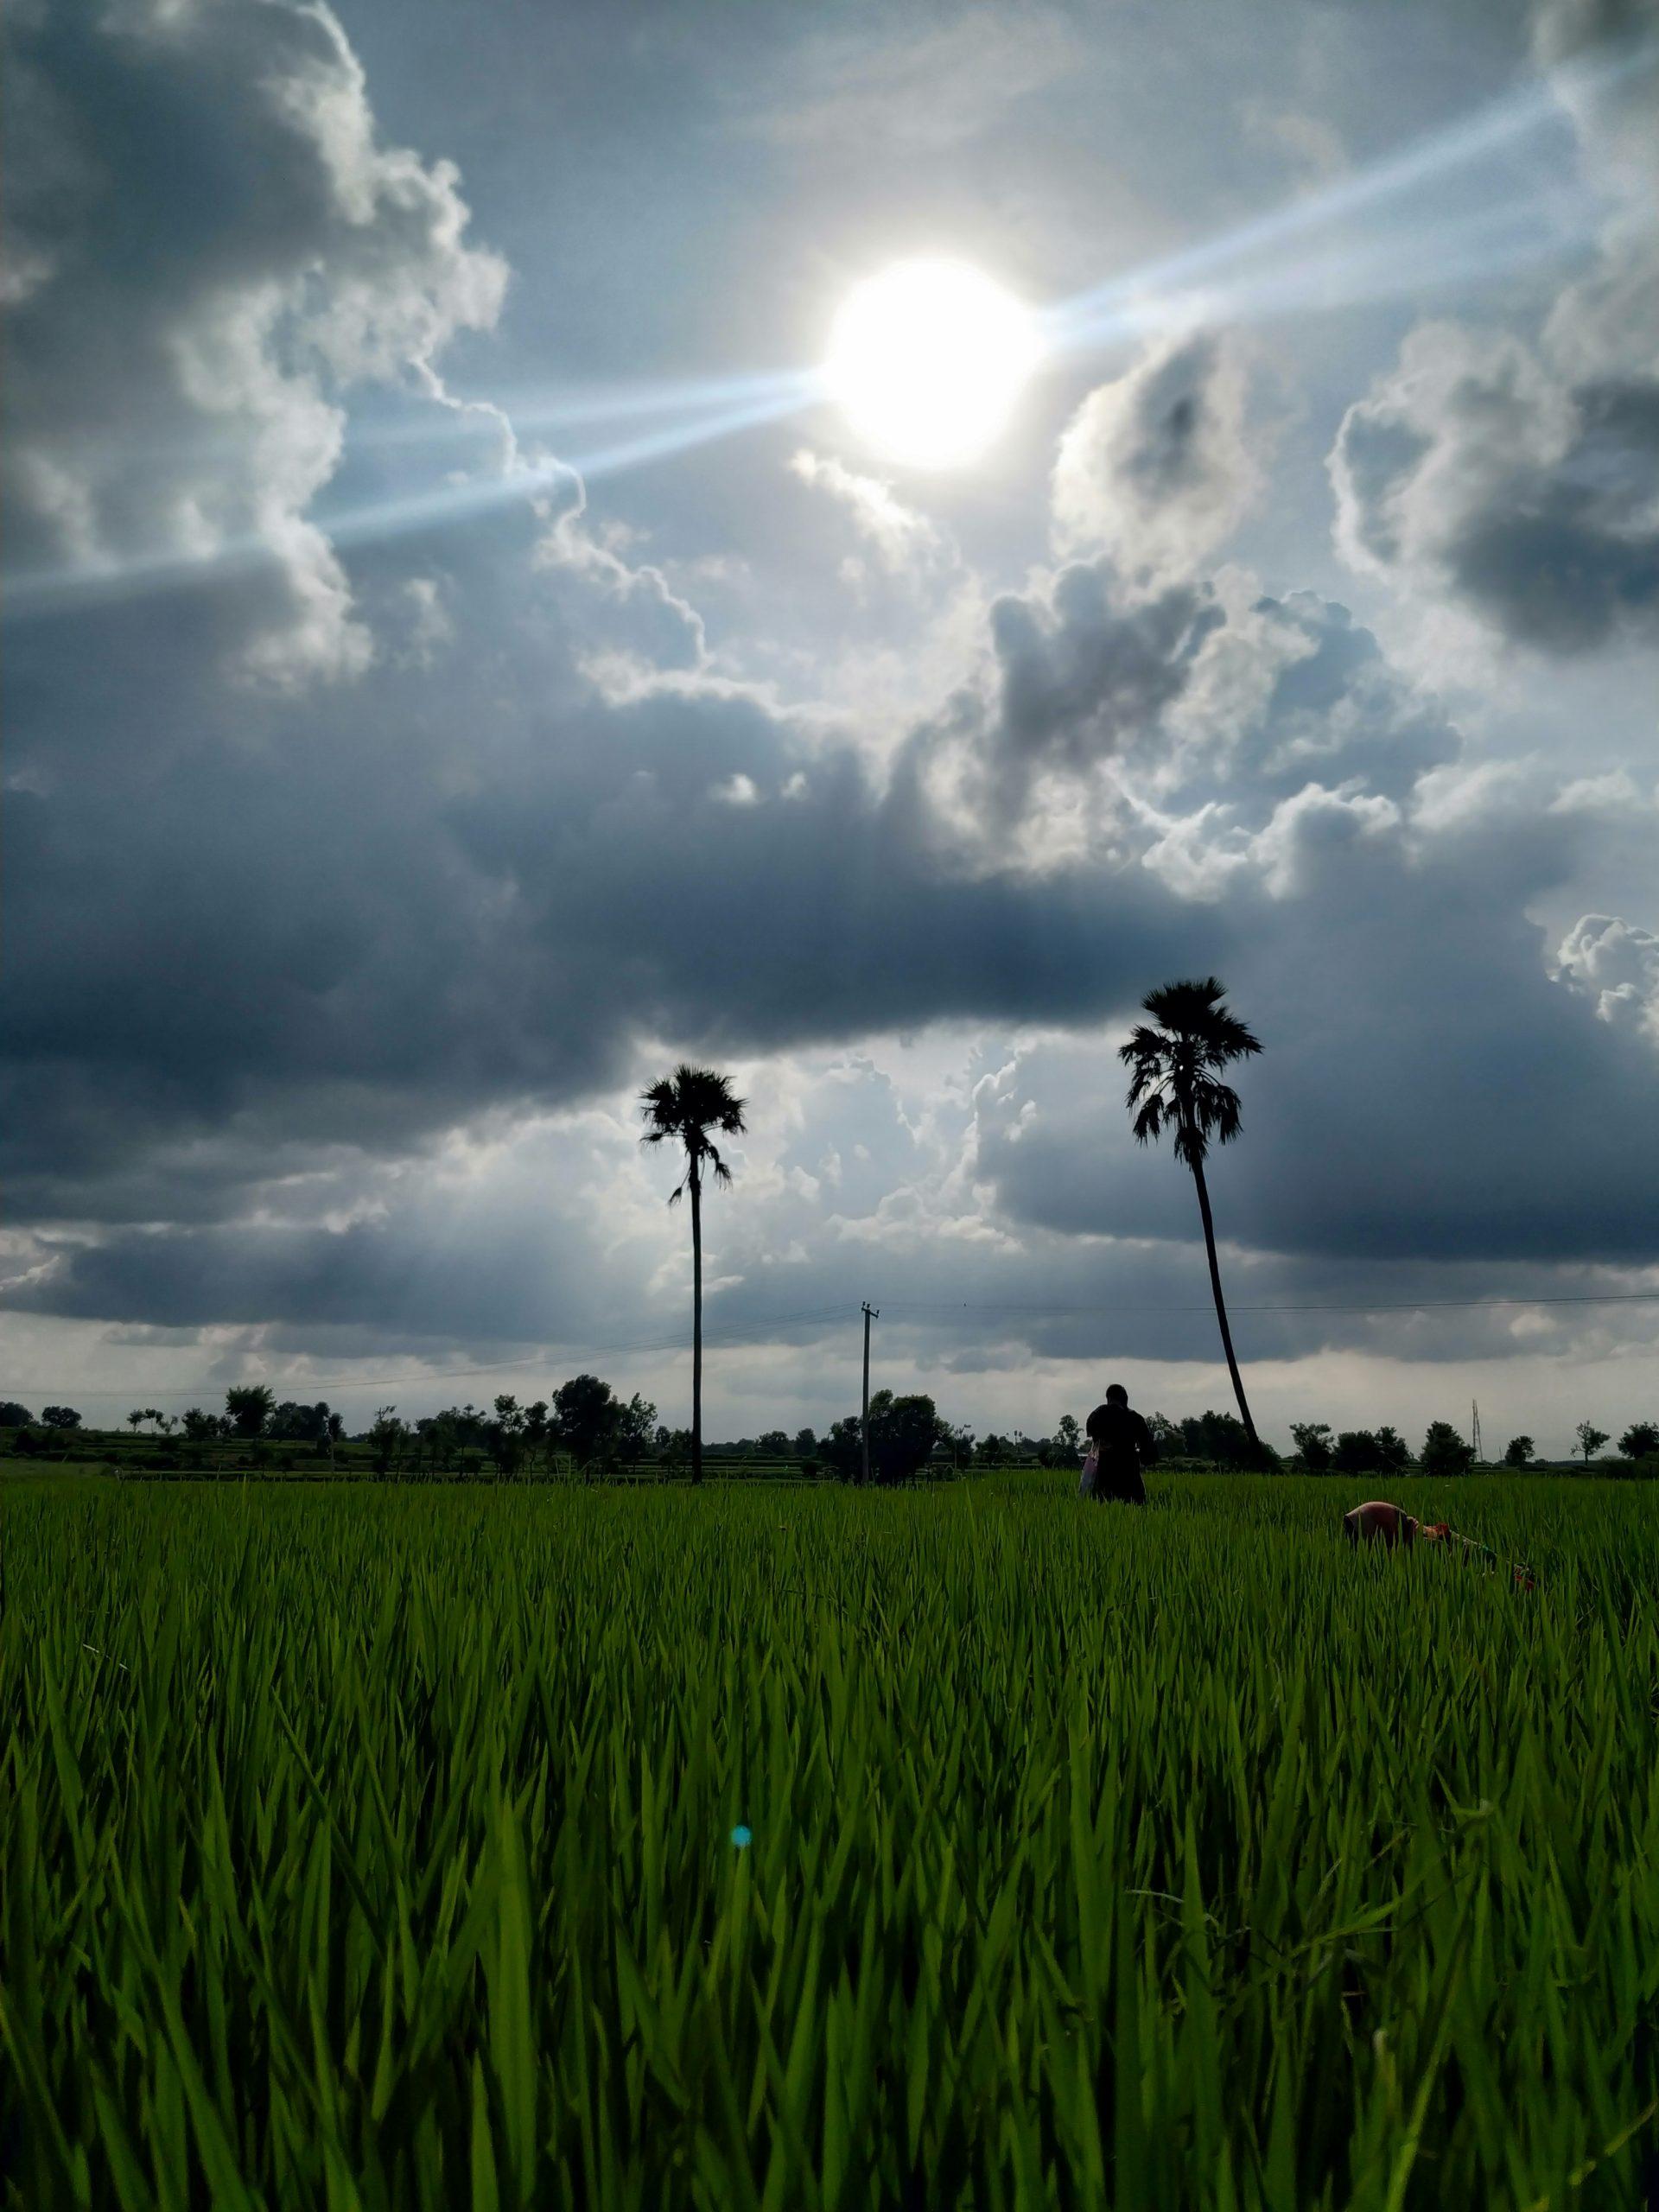 Sunny weather on rice paddies